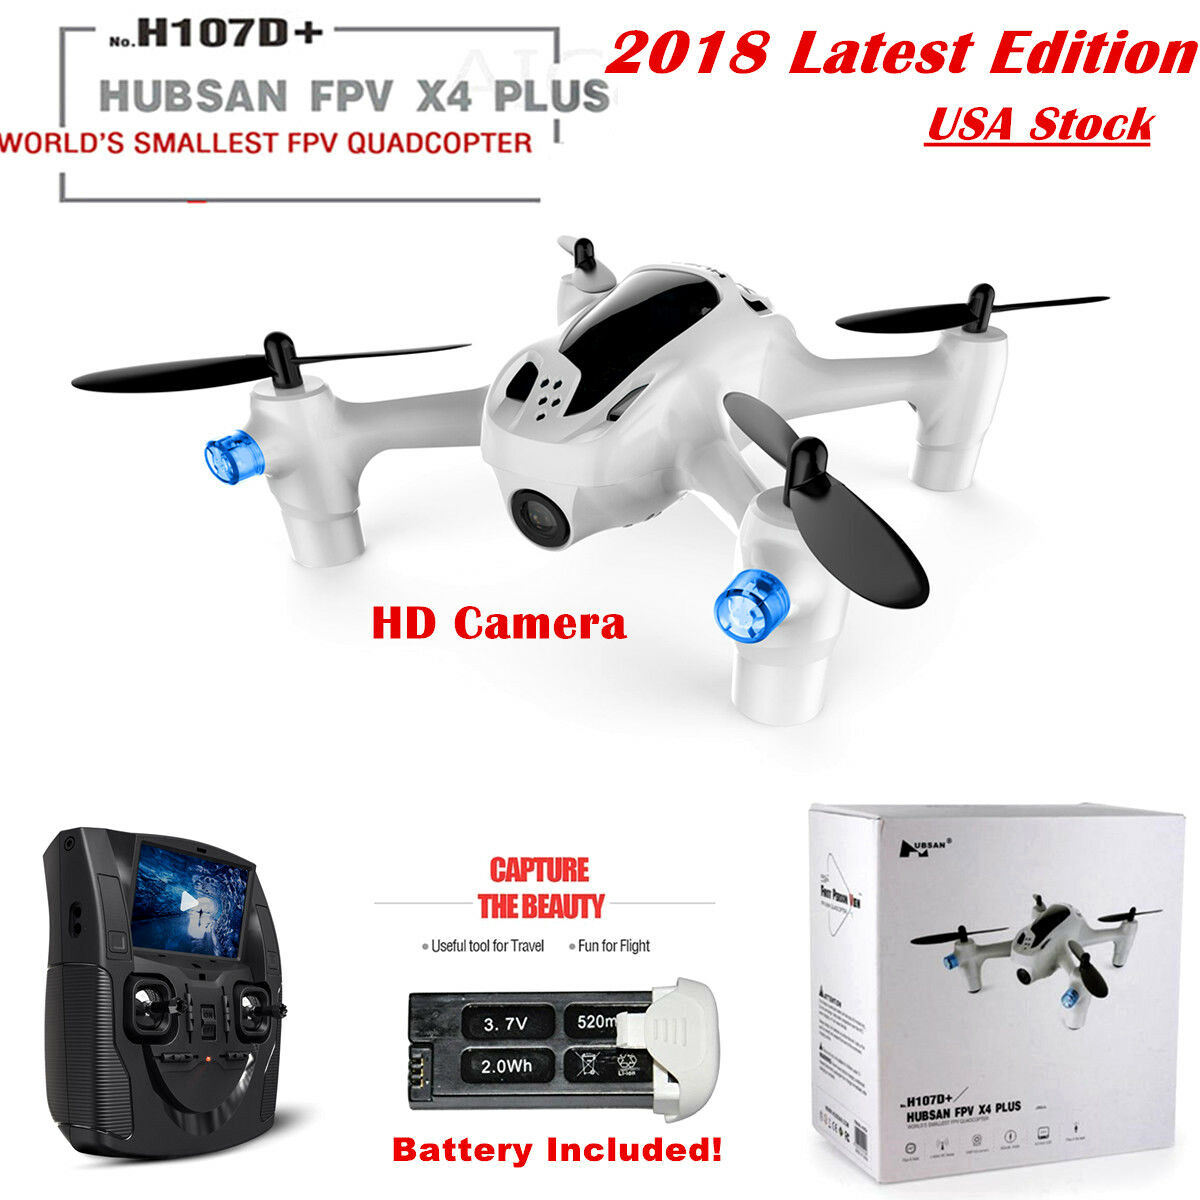 Hubsan X4 H107D+ Plus FPV Drone Mini RC Quadcopter 5.8G 480P LCD Monitor RTF USA